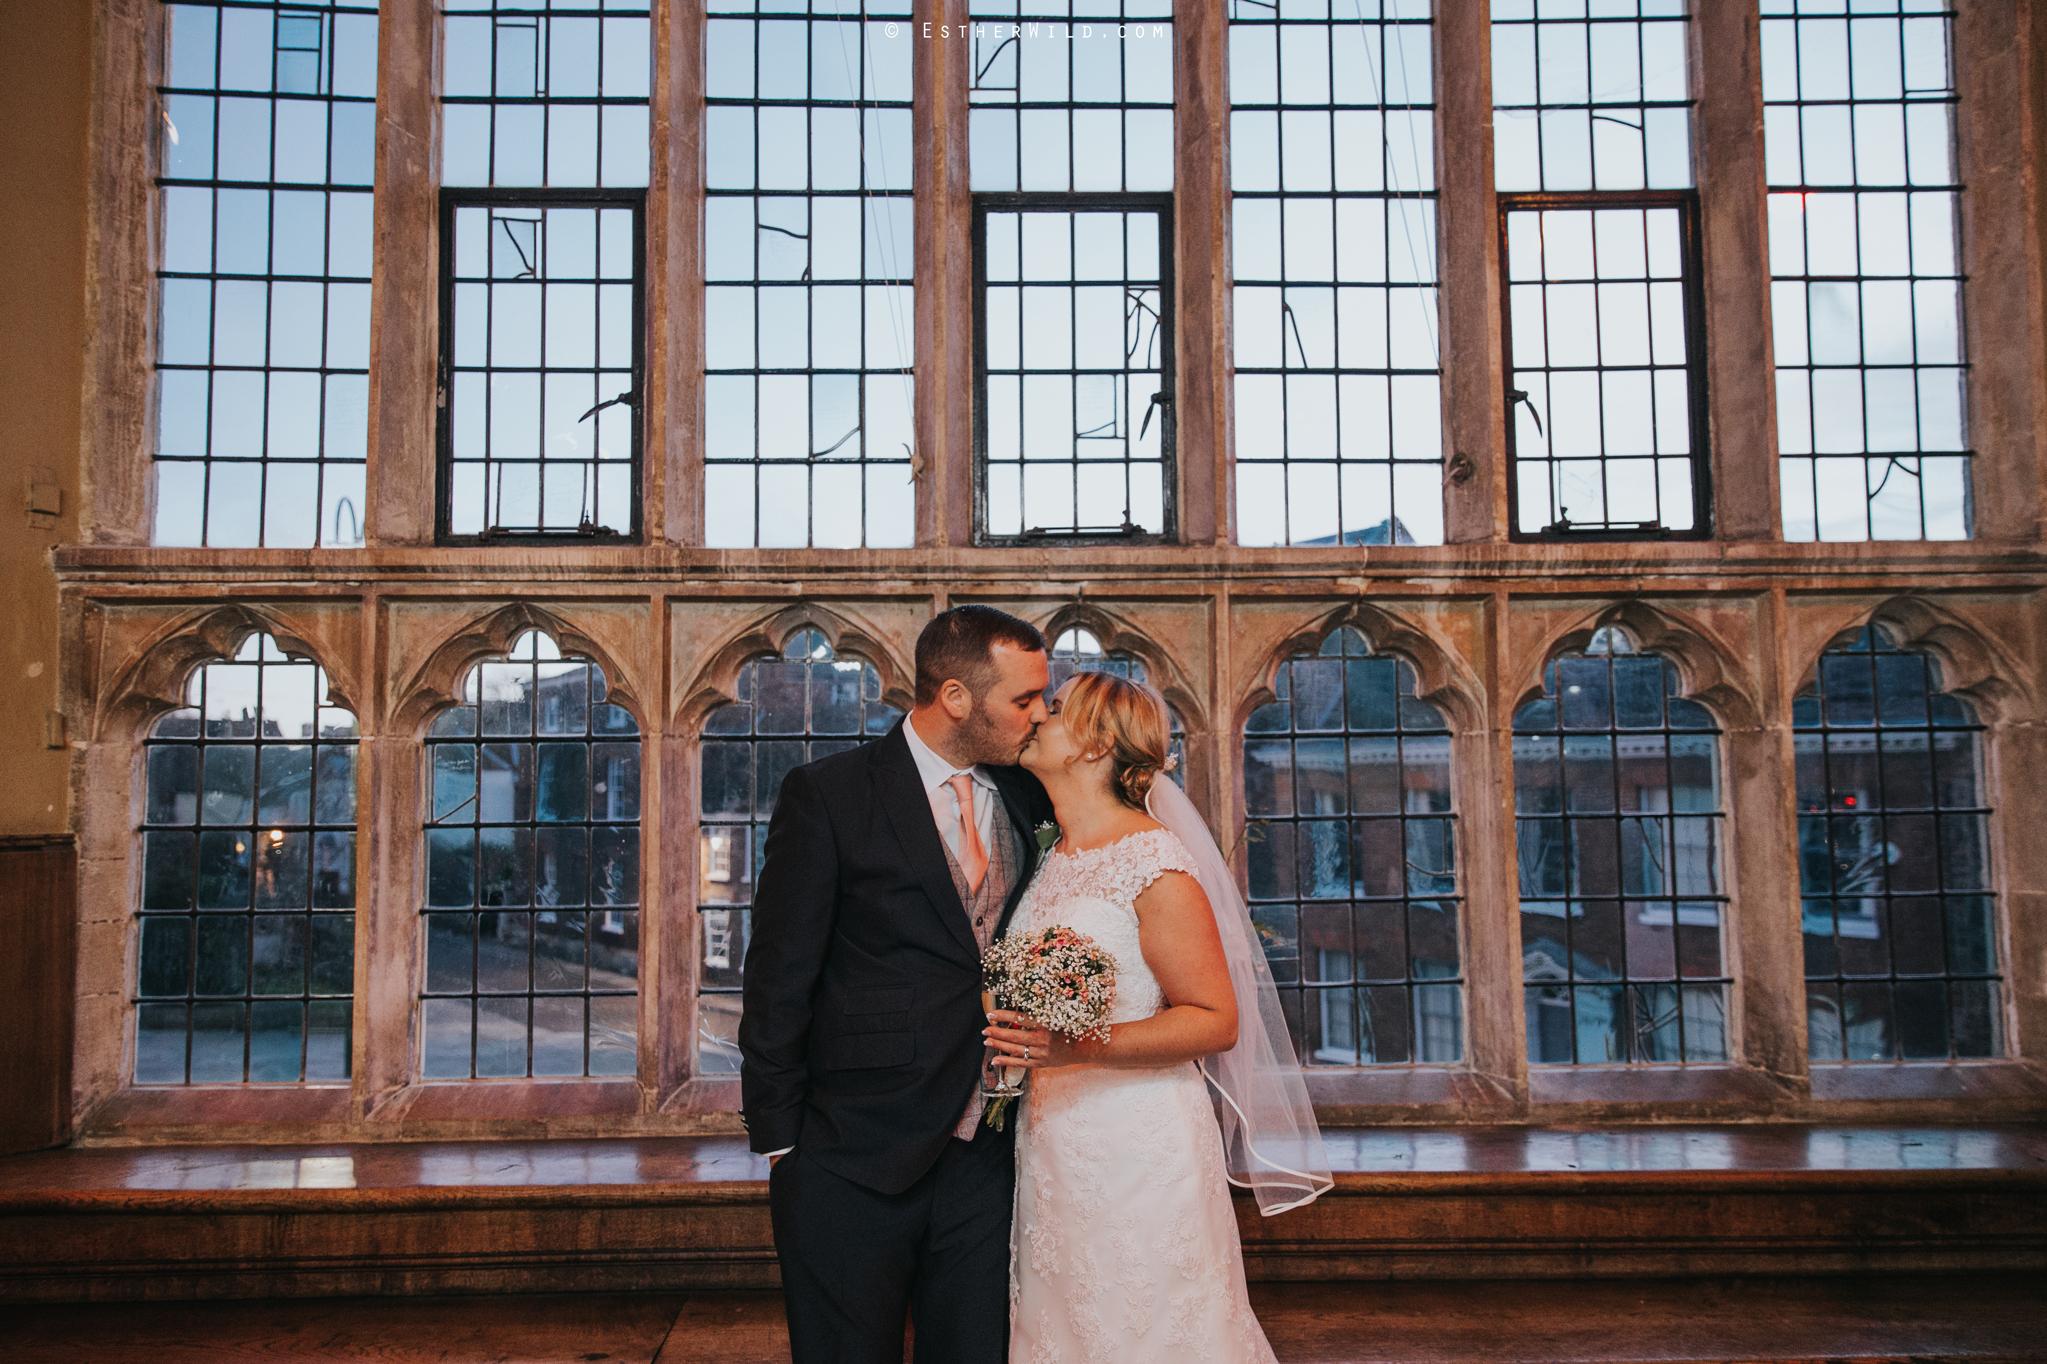 Wedding_Kings_Lynn_Town_Hall_Norfolk_Photographer_Esther_Wild_IMG_1444.jpg